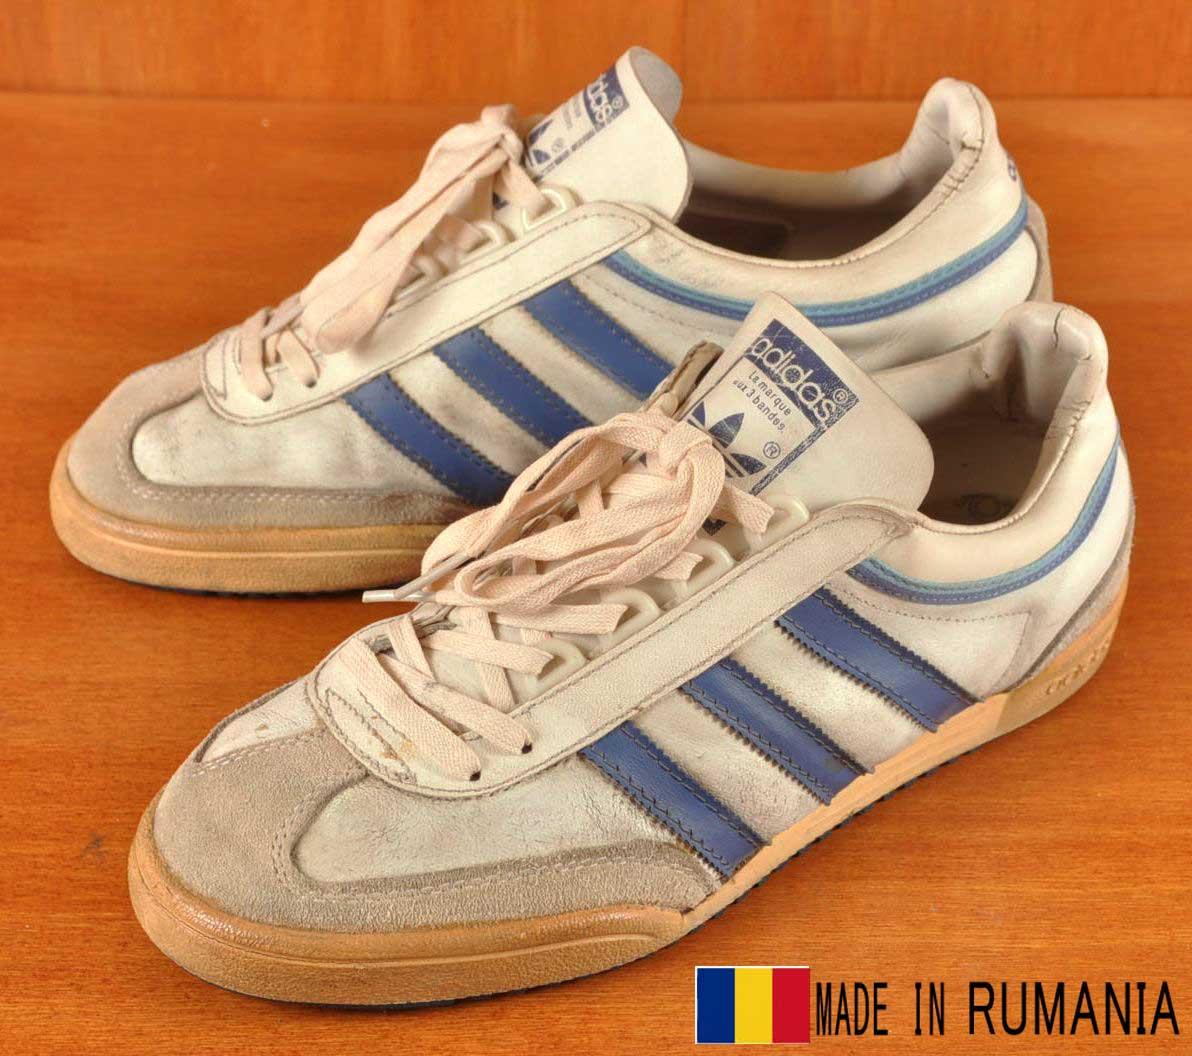 Vintage 1980 s Romania made   adidas adidas   Pacific Pacific   locate  sneaker   White x blue leather   JPN26.0cm  467b2698575b